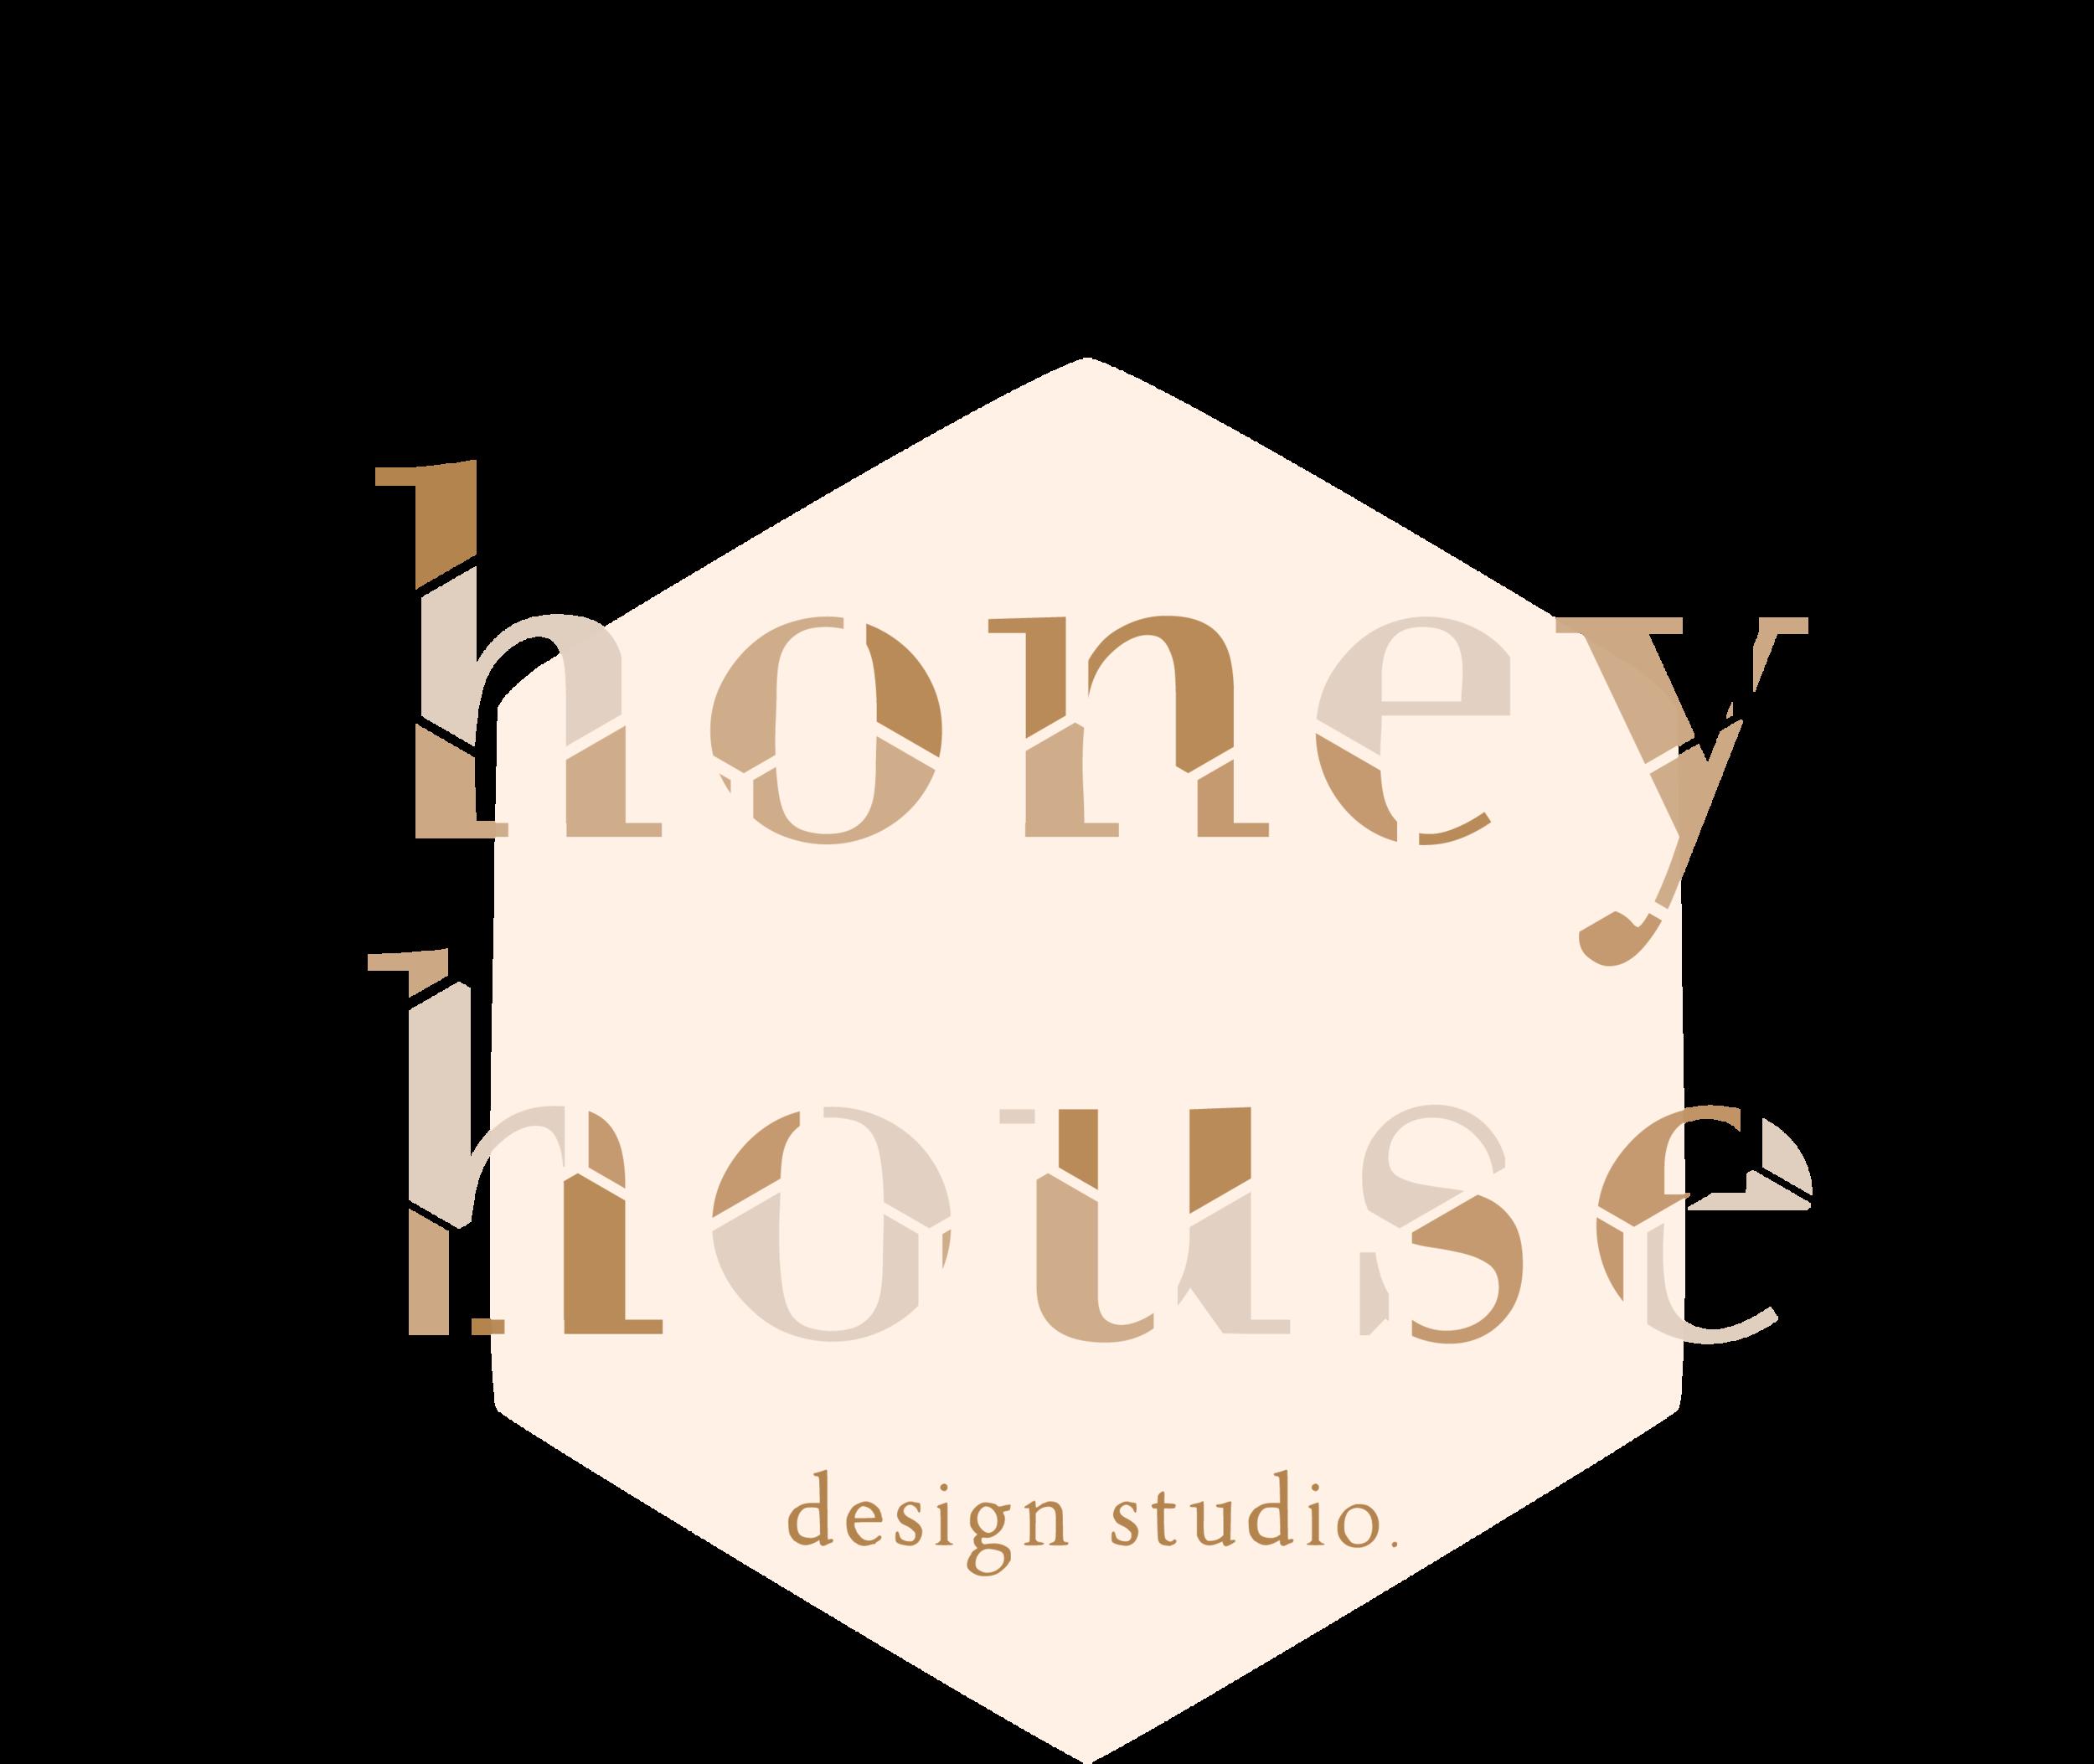 honeyhouselogo.png